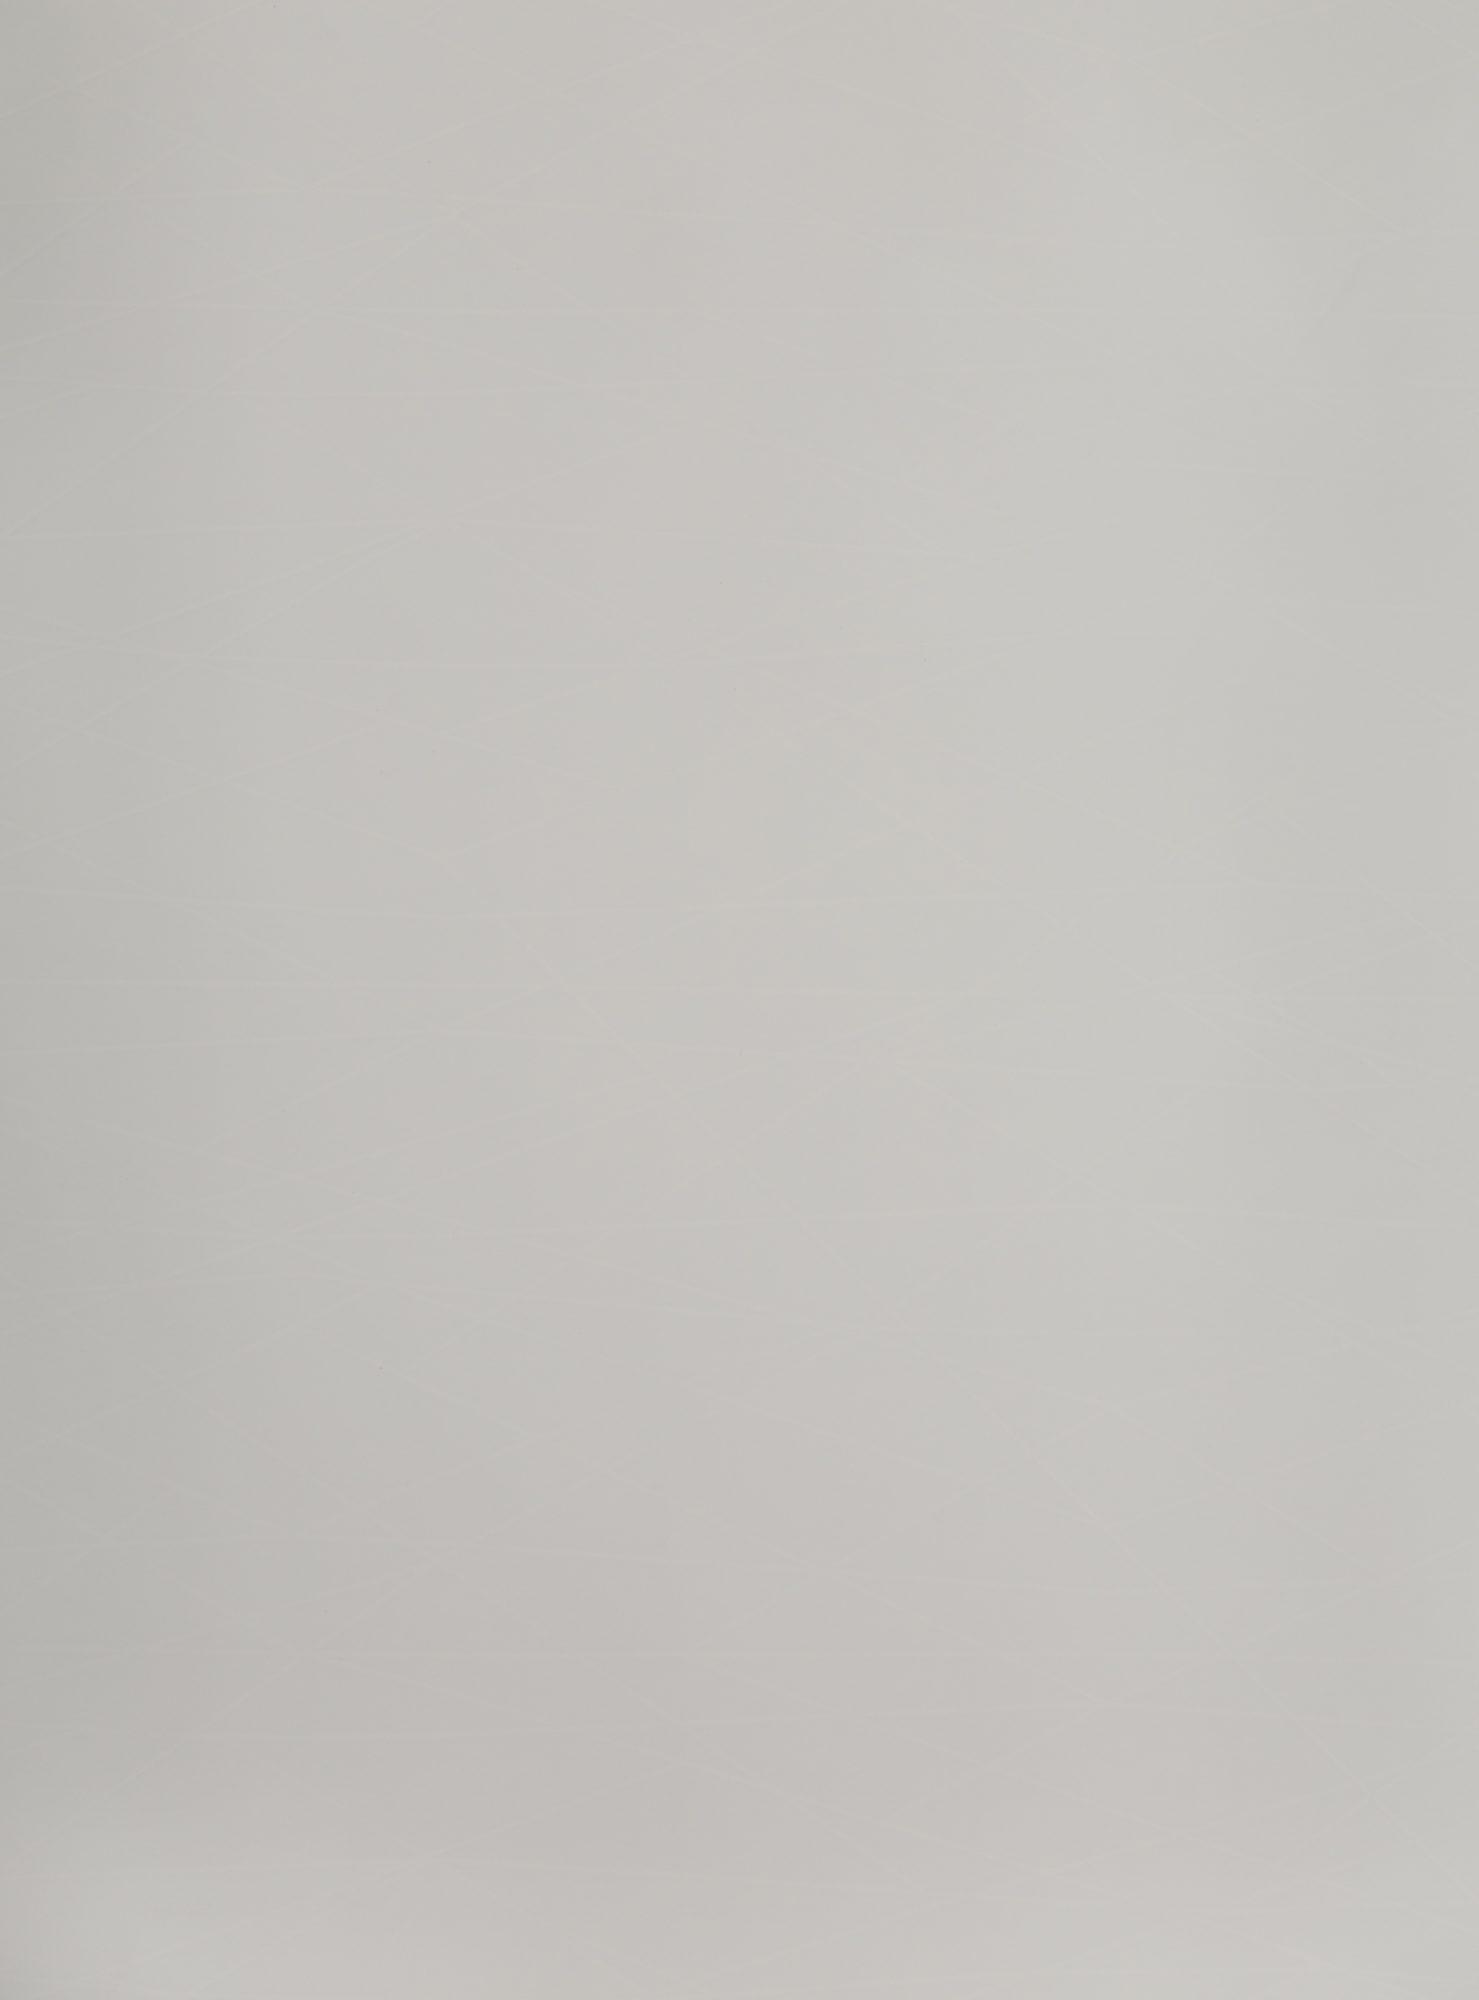 DecoLegno by Cleaf - B011 Shanghai Tekenprogramma 2800x2070mm